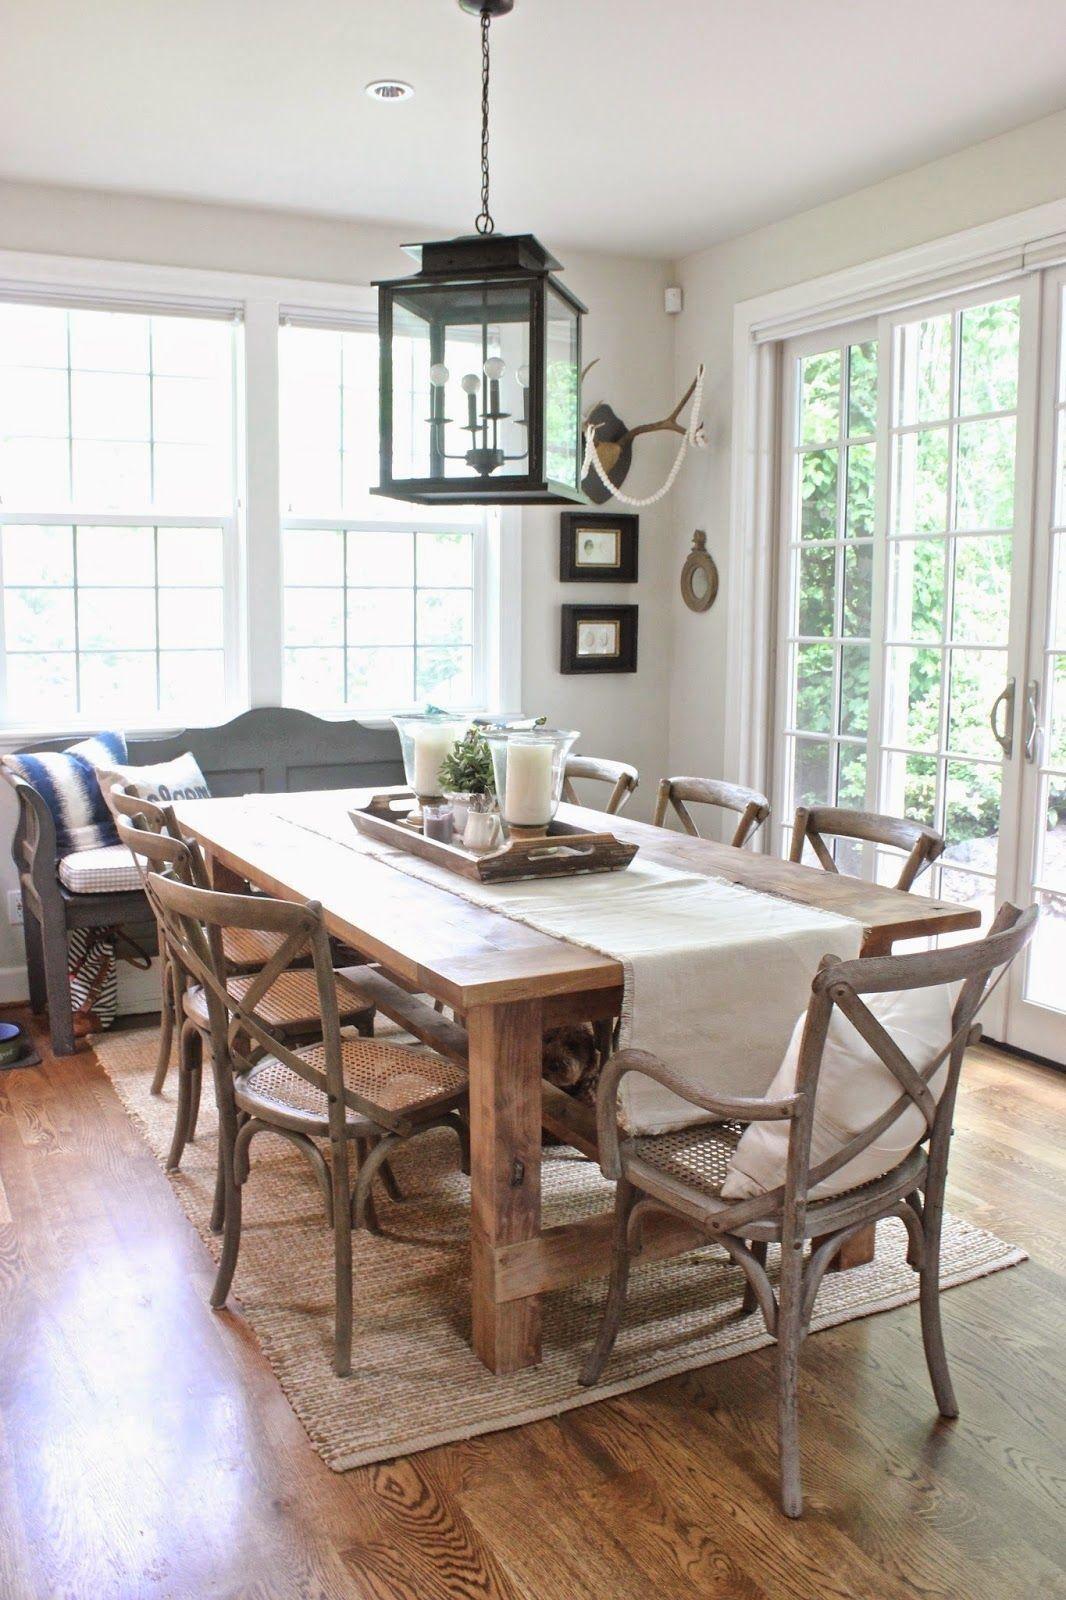 10+ Everyday dining room table decor ideas